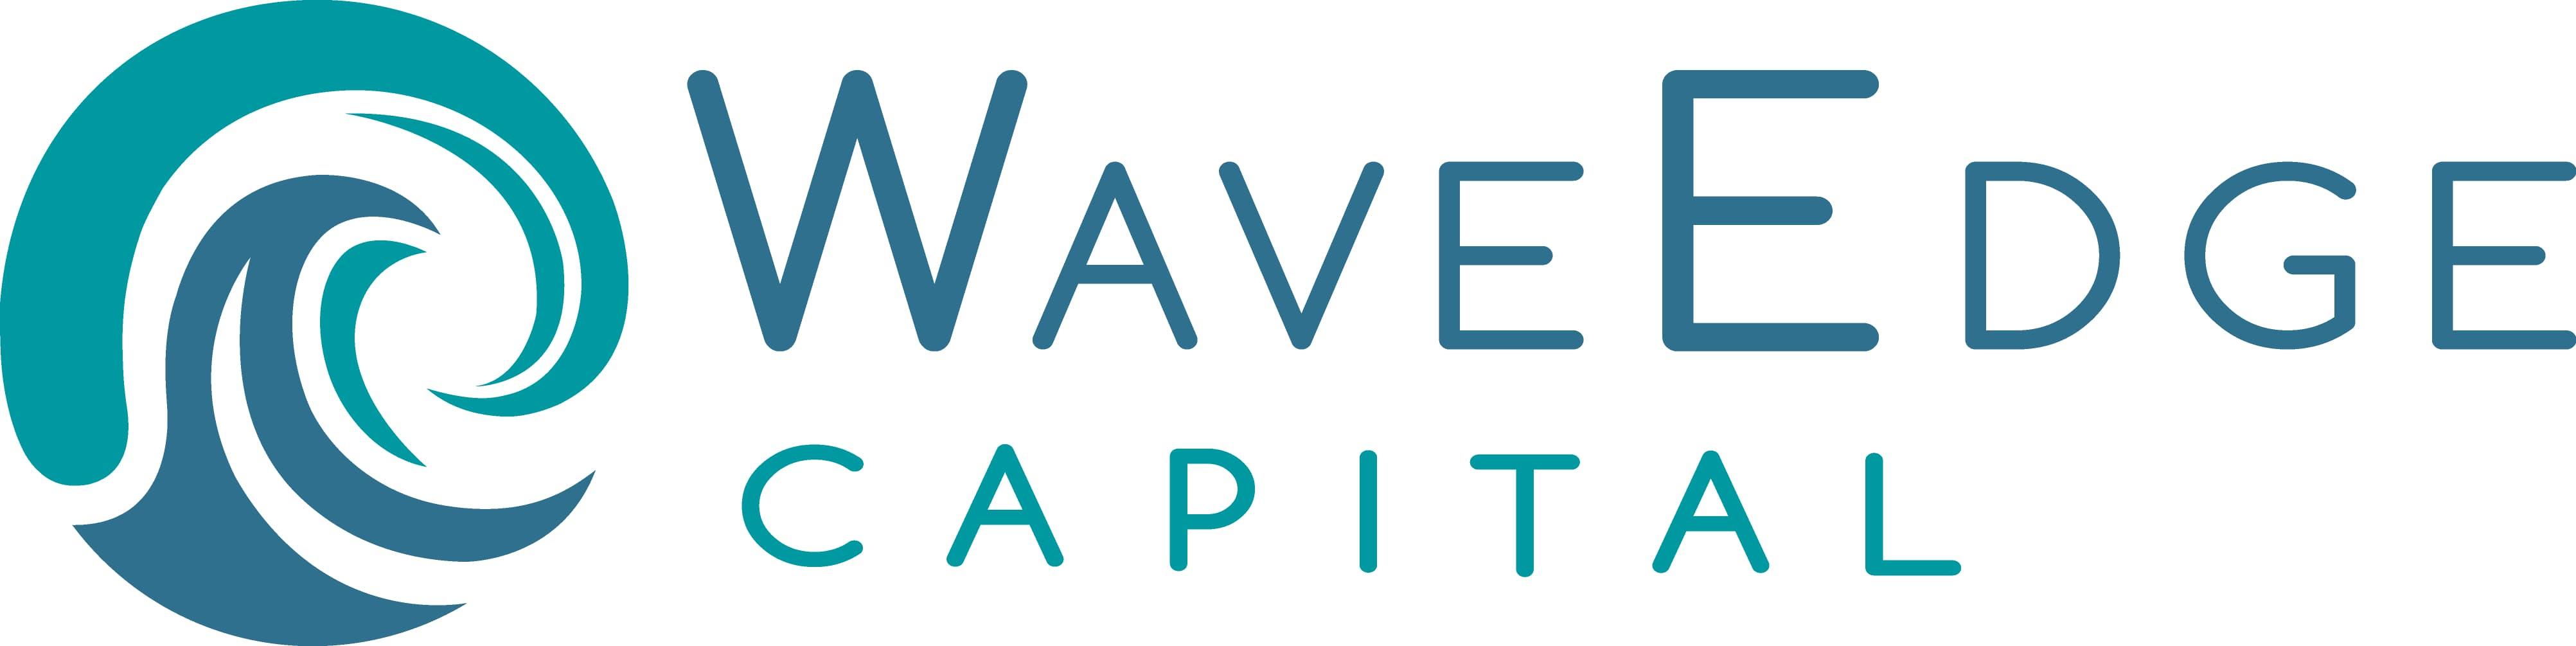 WaveEdge Capital